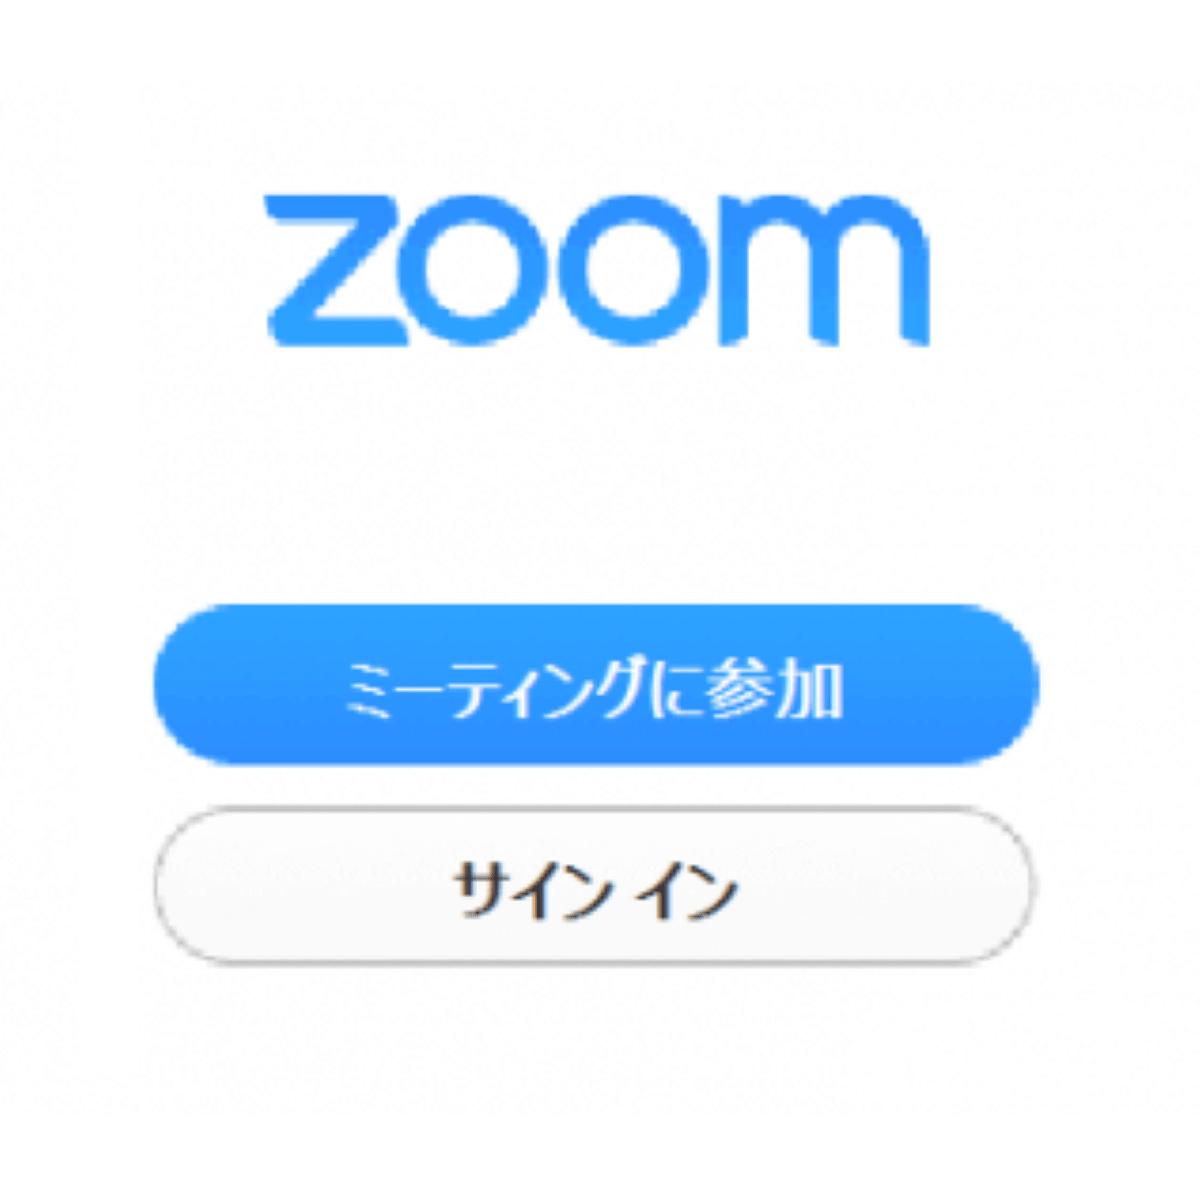 zoomのロゴ